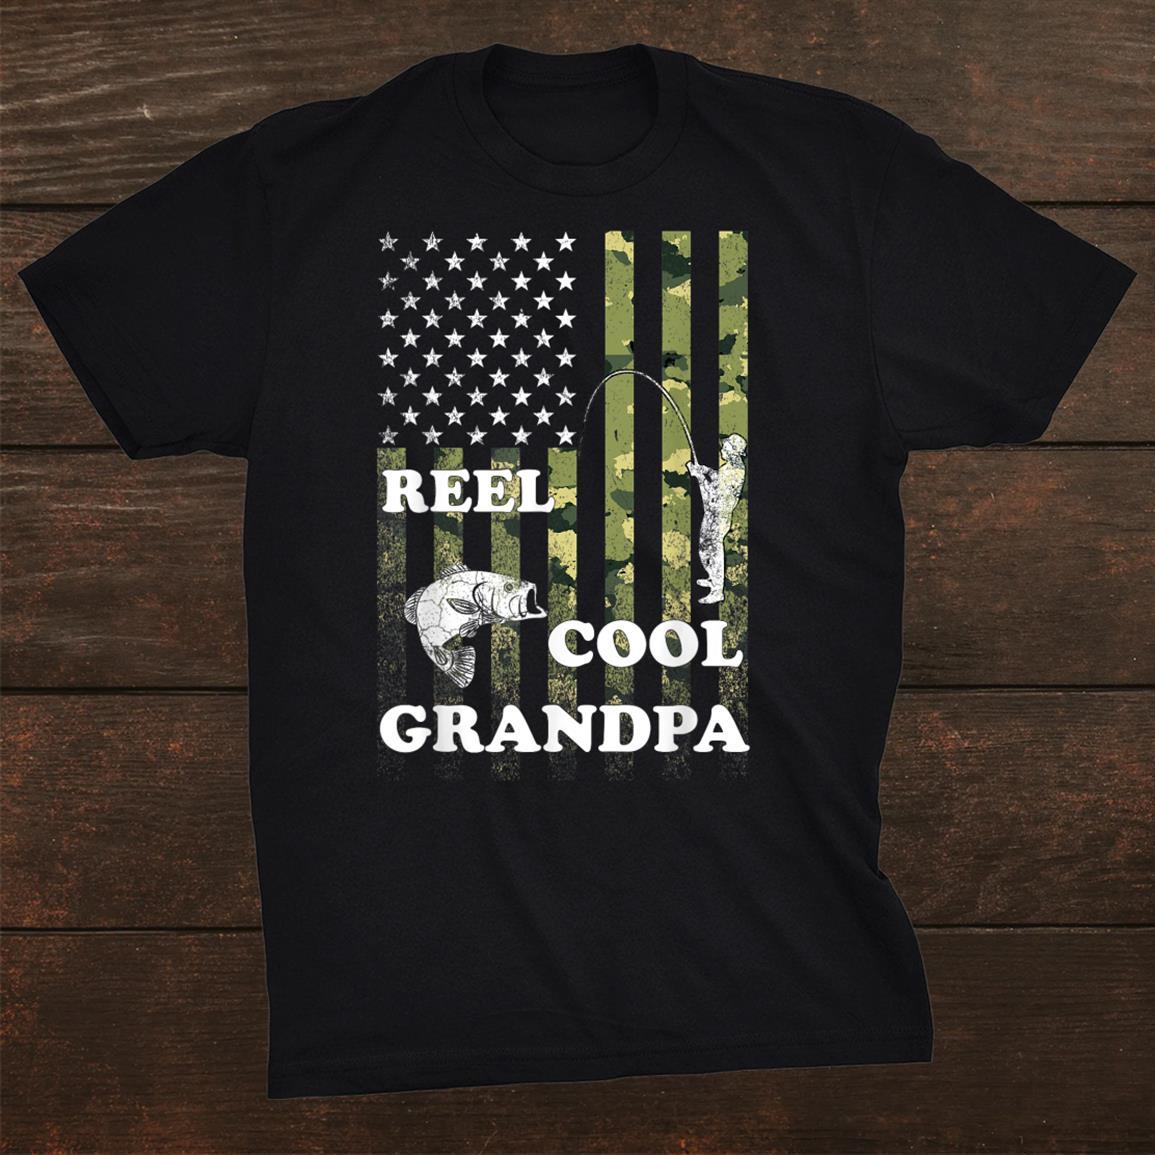 Reel Cool Grandpa Fishing Gift For Papa Funny Shirt